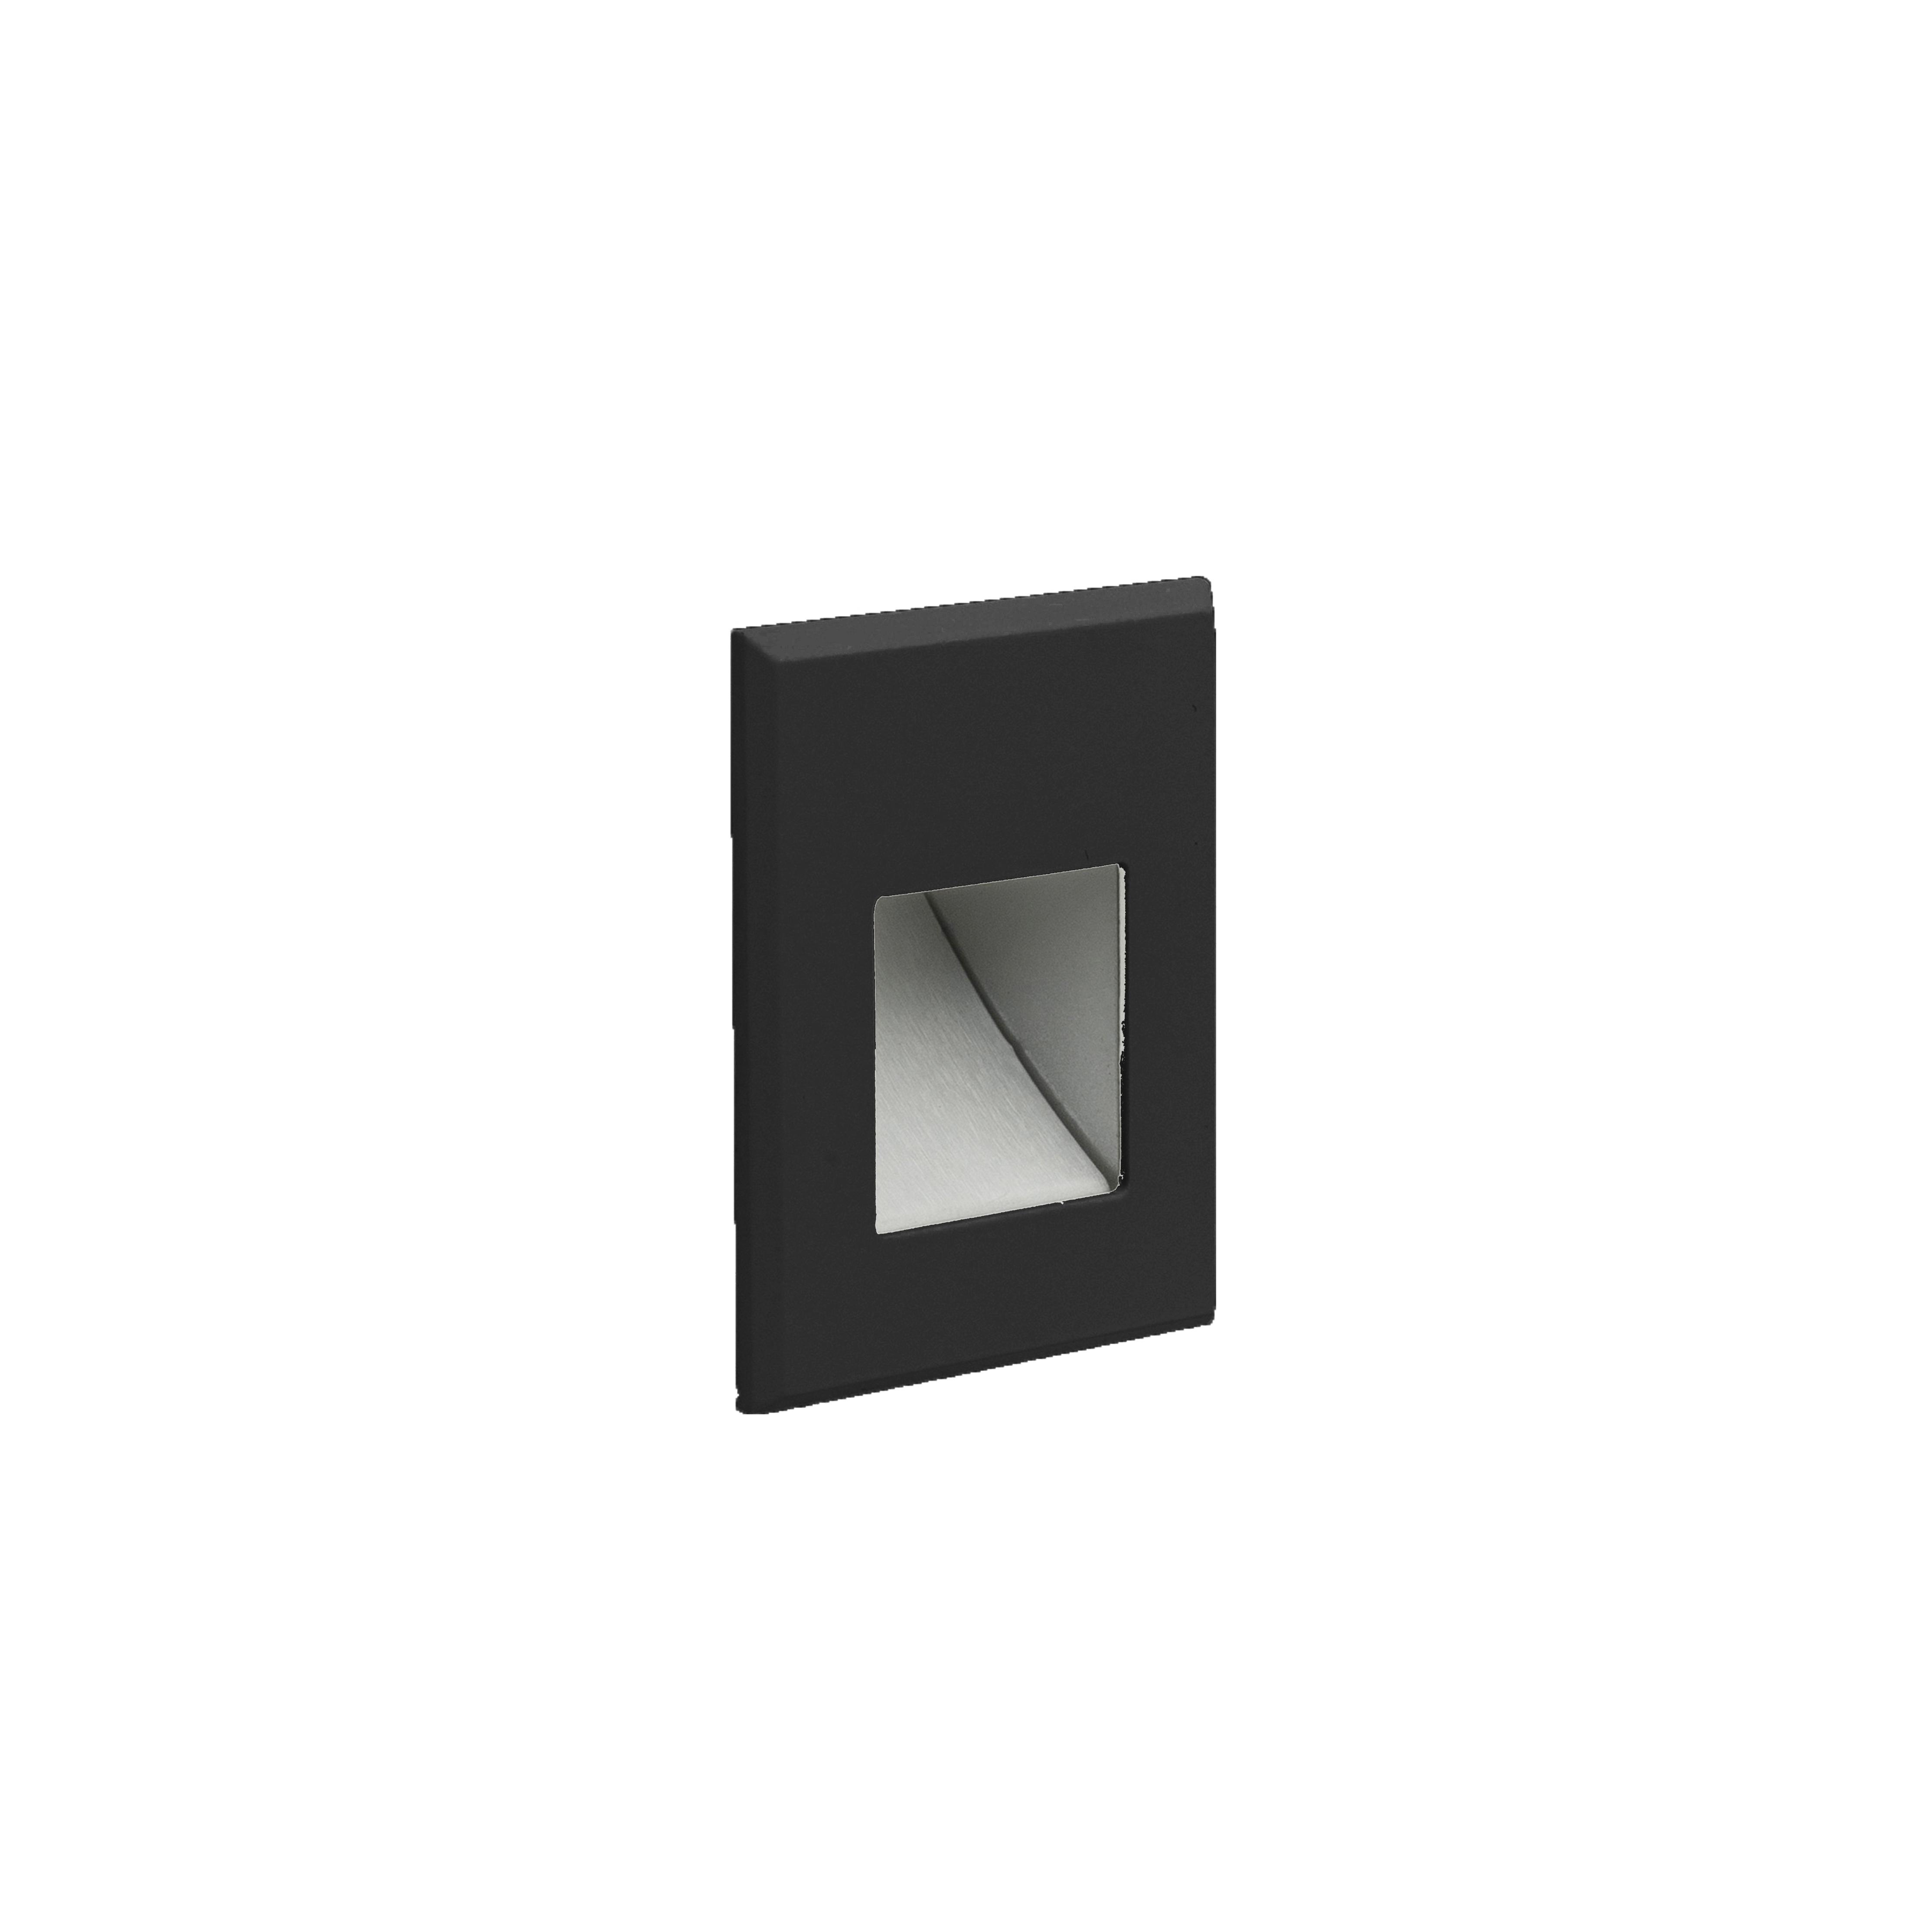 Cazalla² Black 2700K main image